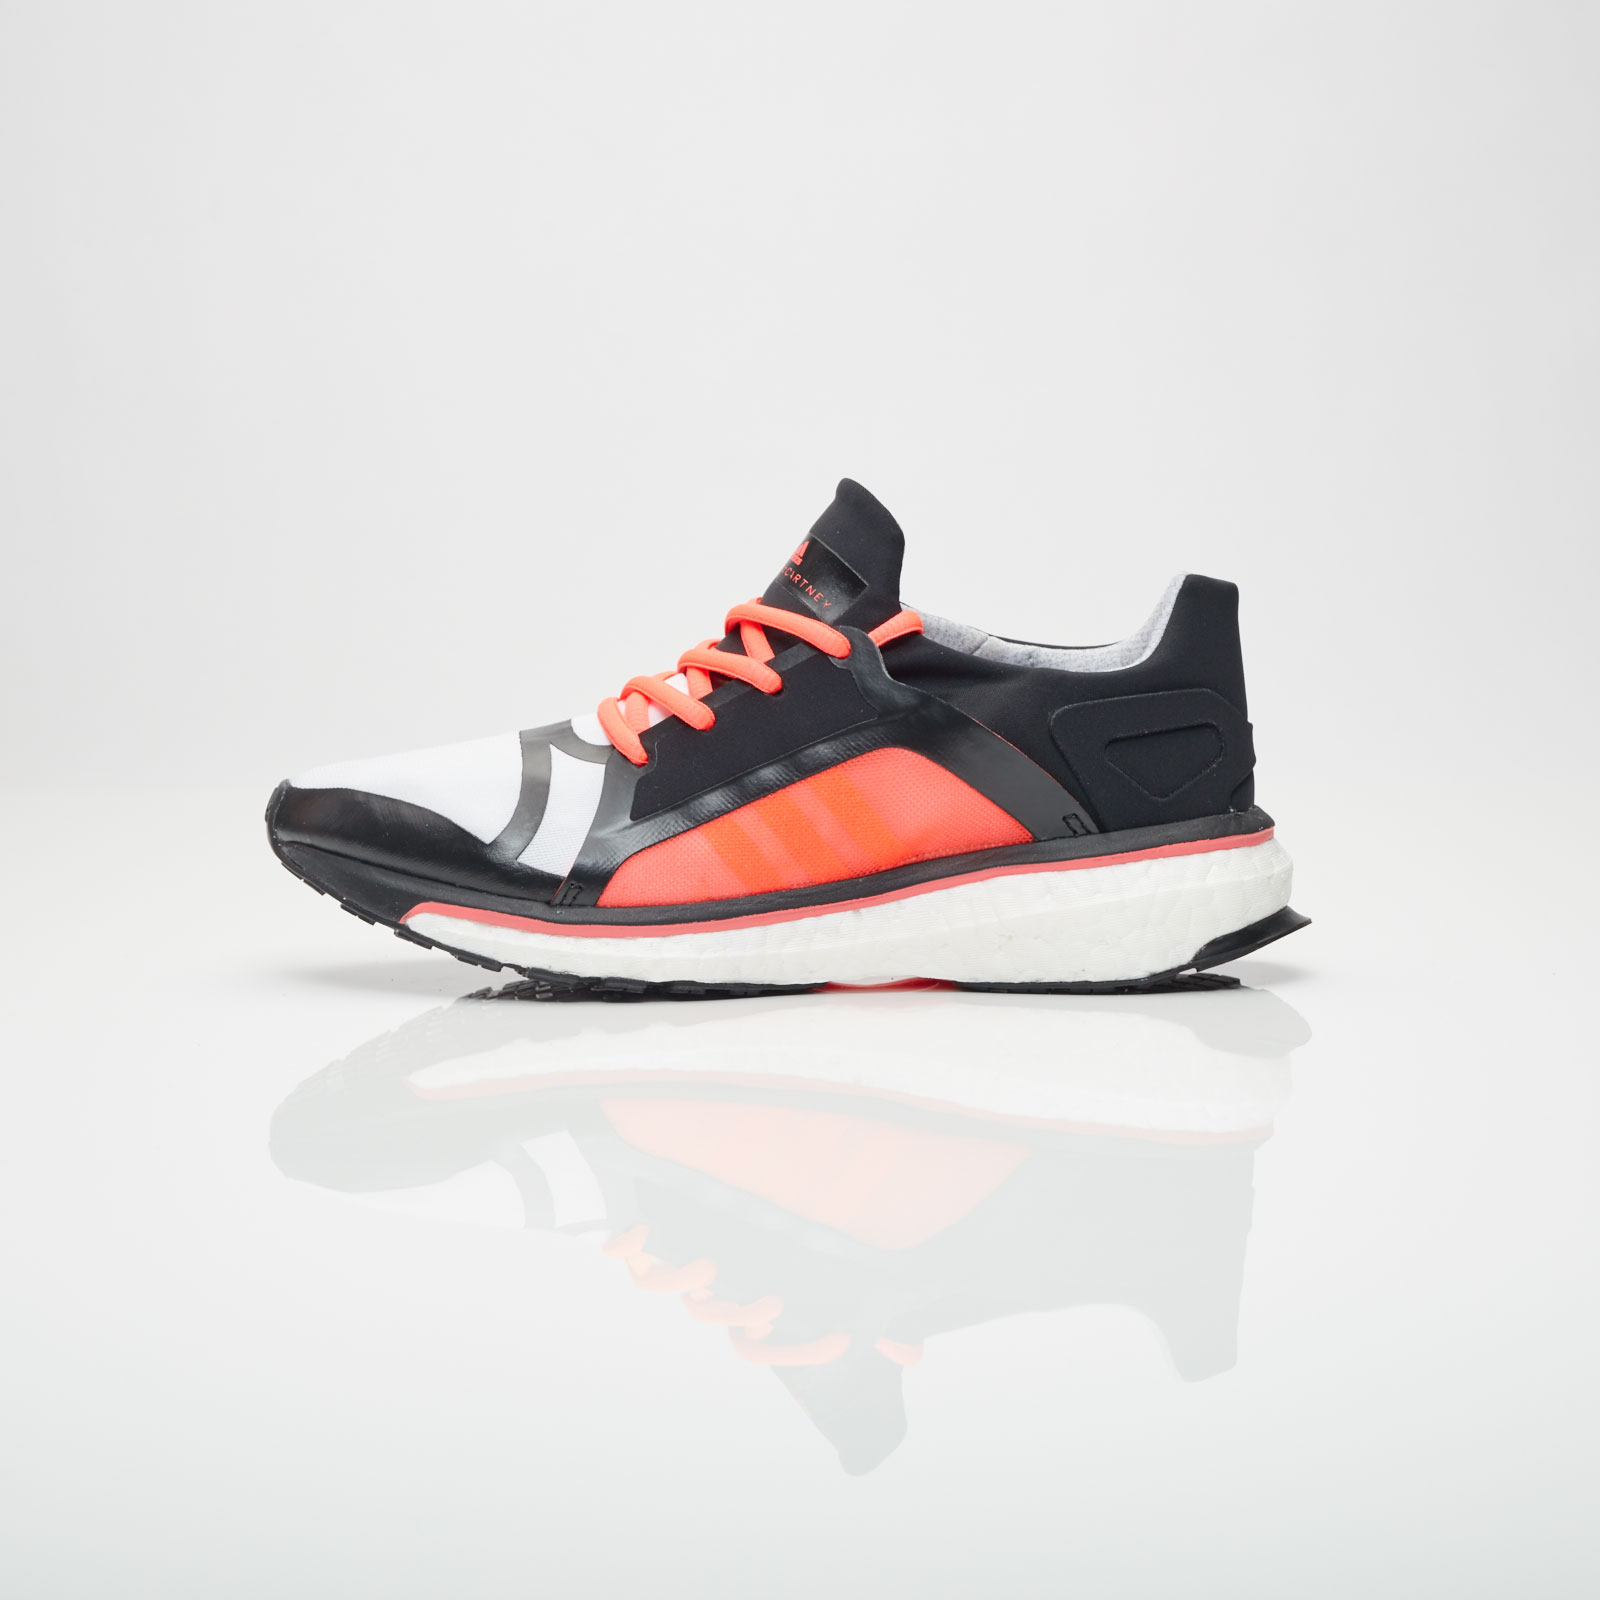 5b6834425f9ae adidas Energy Boost - Bz0537 - Sneakersnstuff